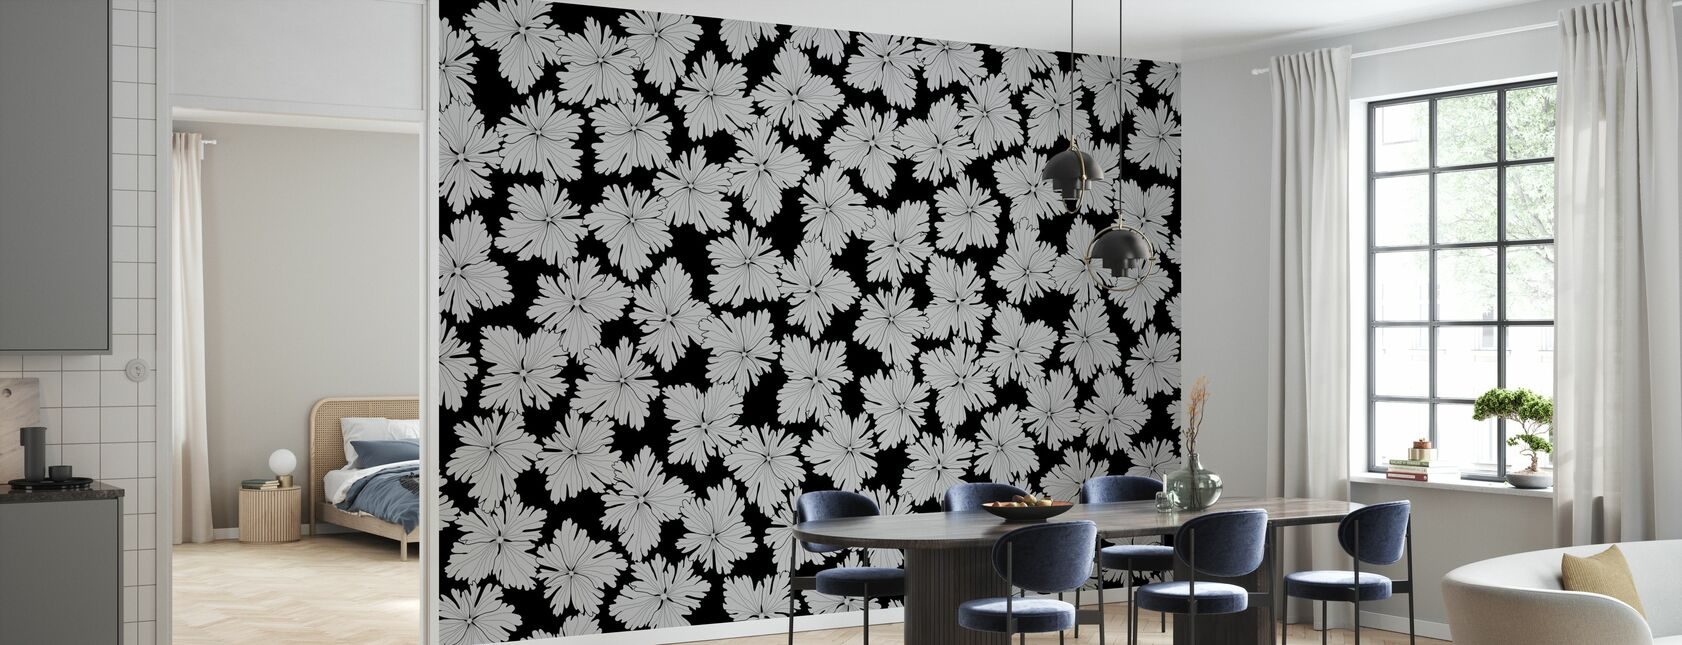 Anemonblad - Black - Wallpaper - Kitchen